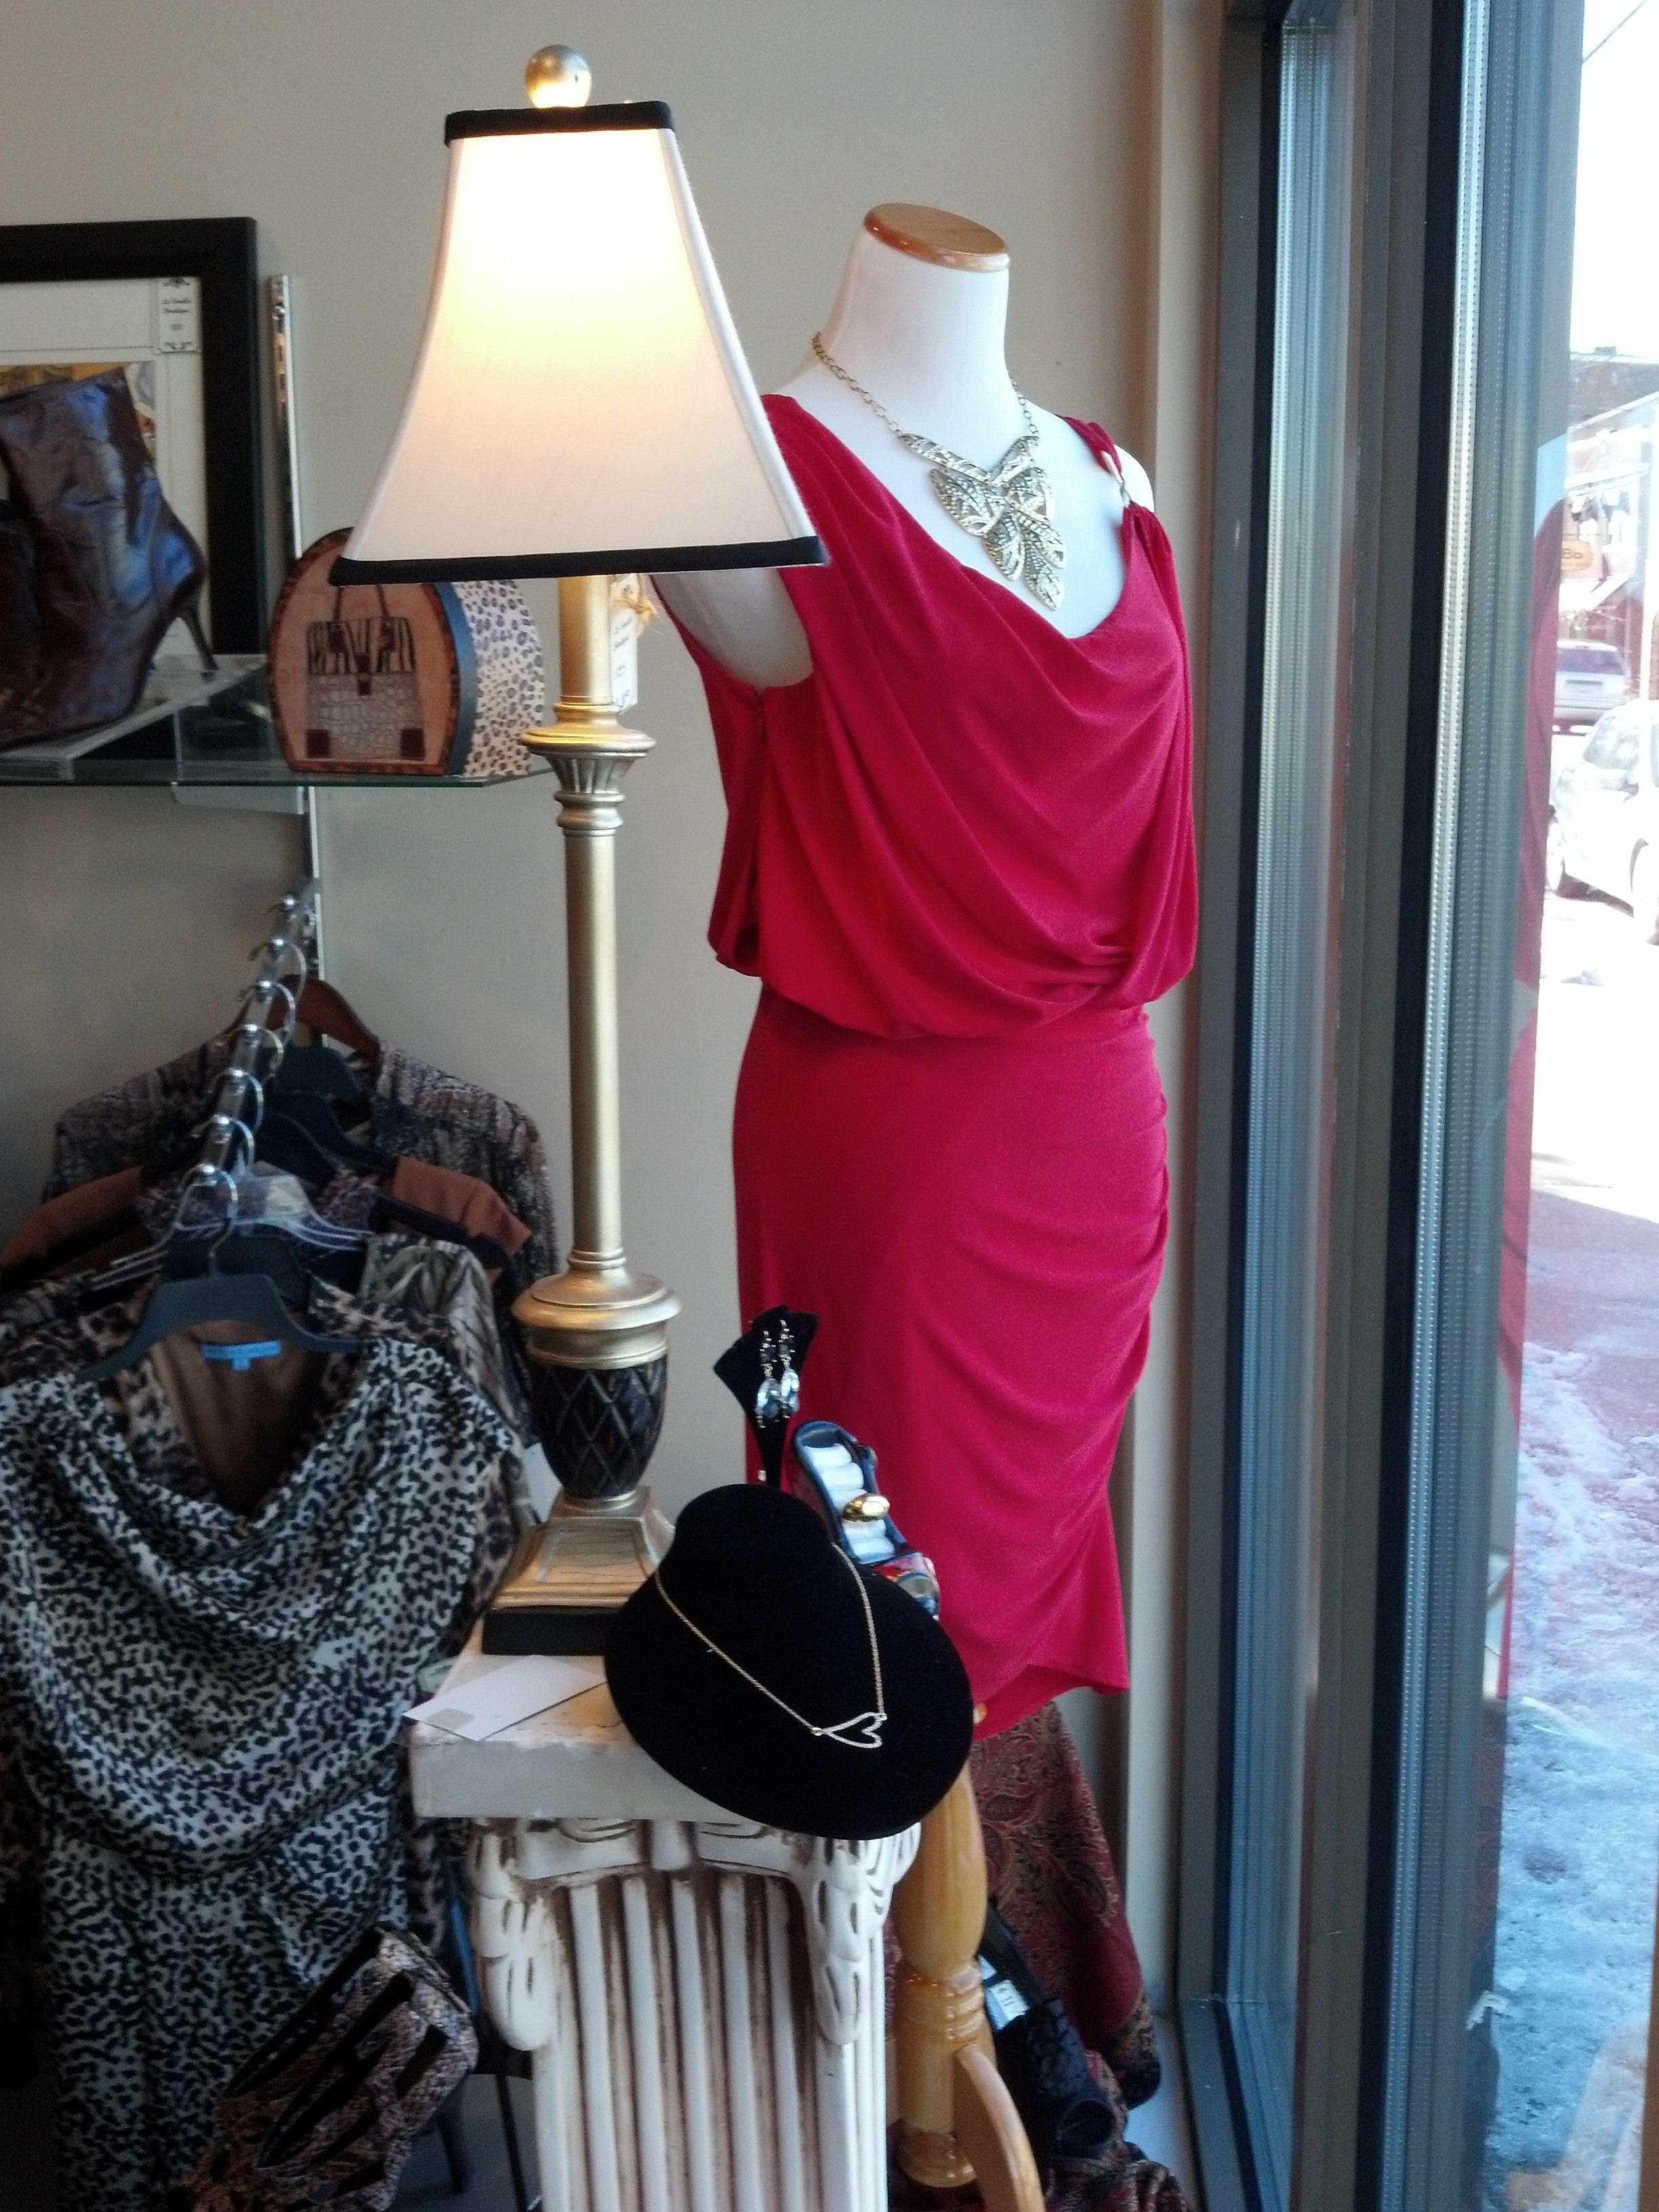 pic 2 dress window